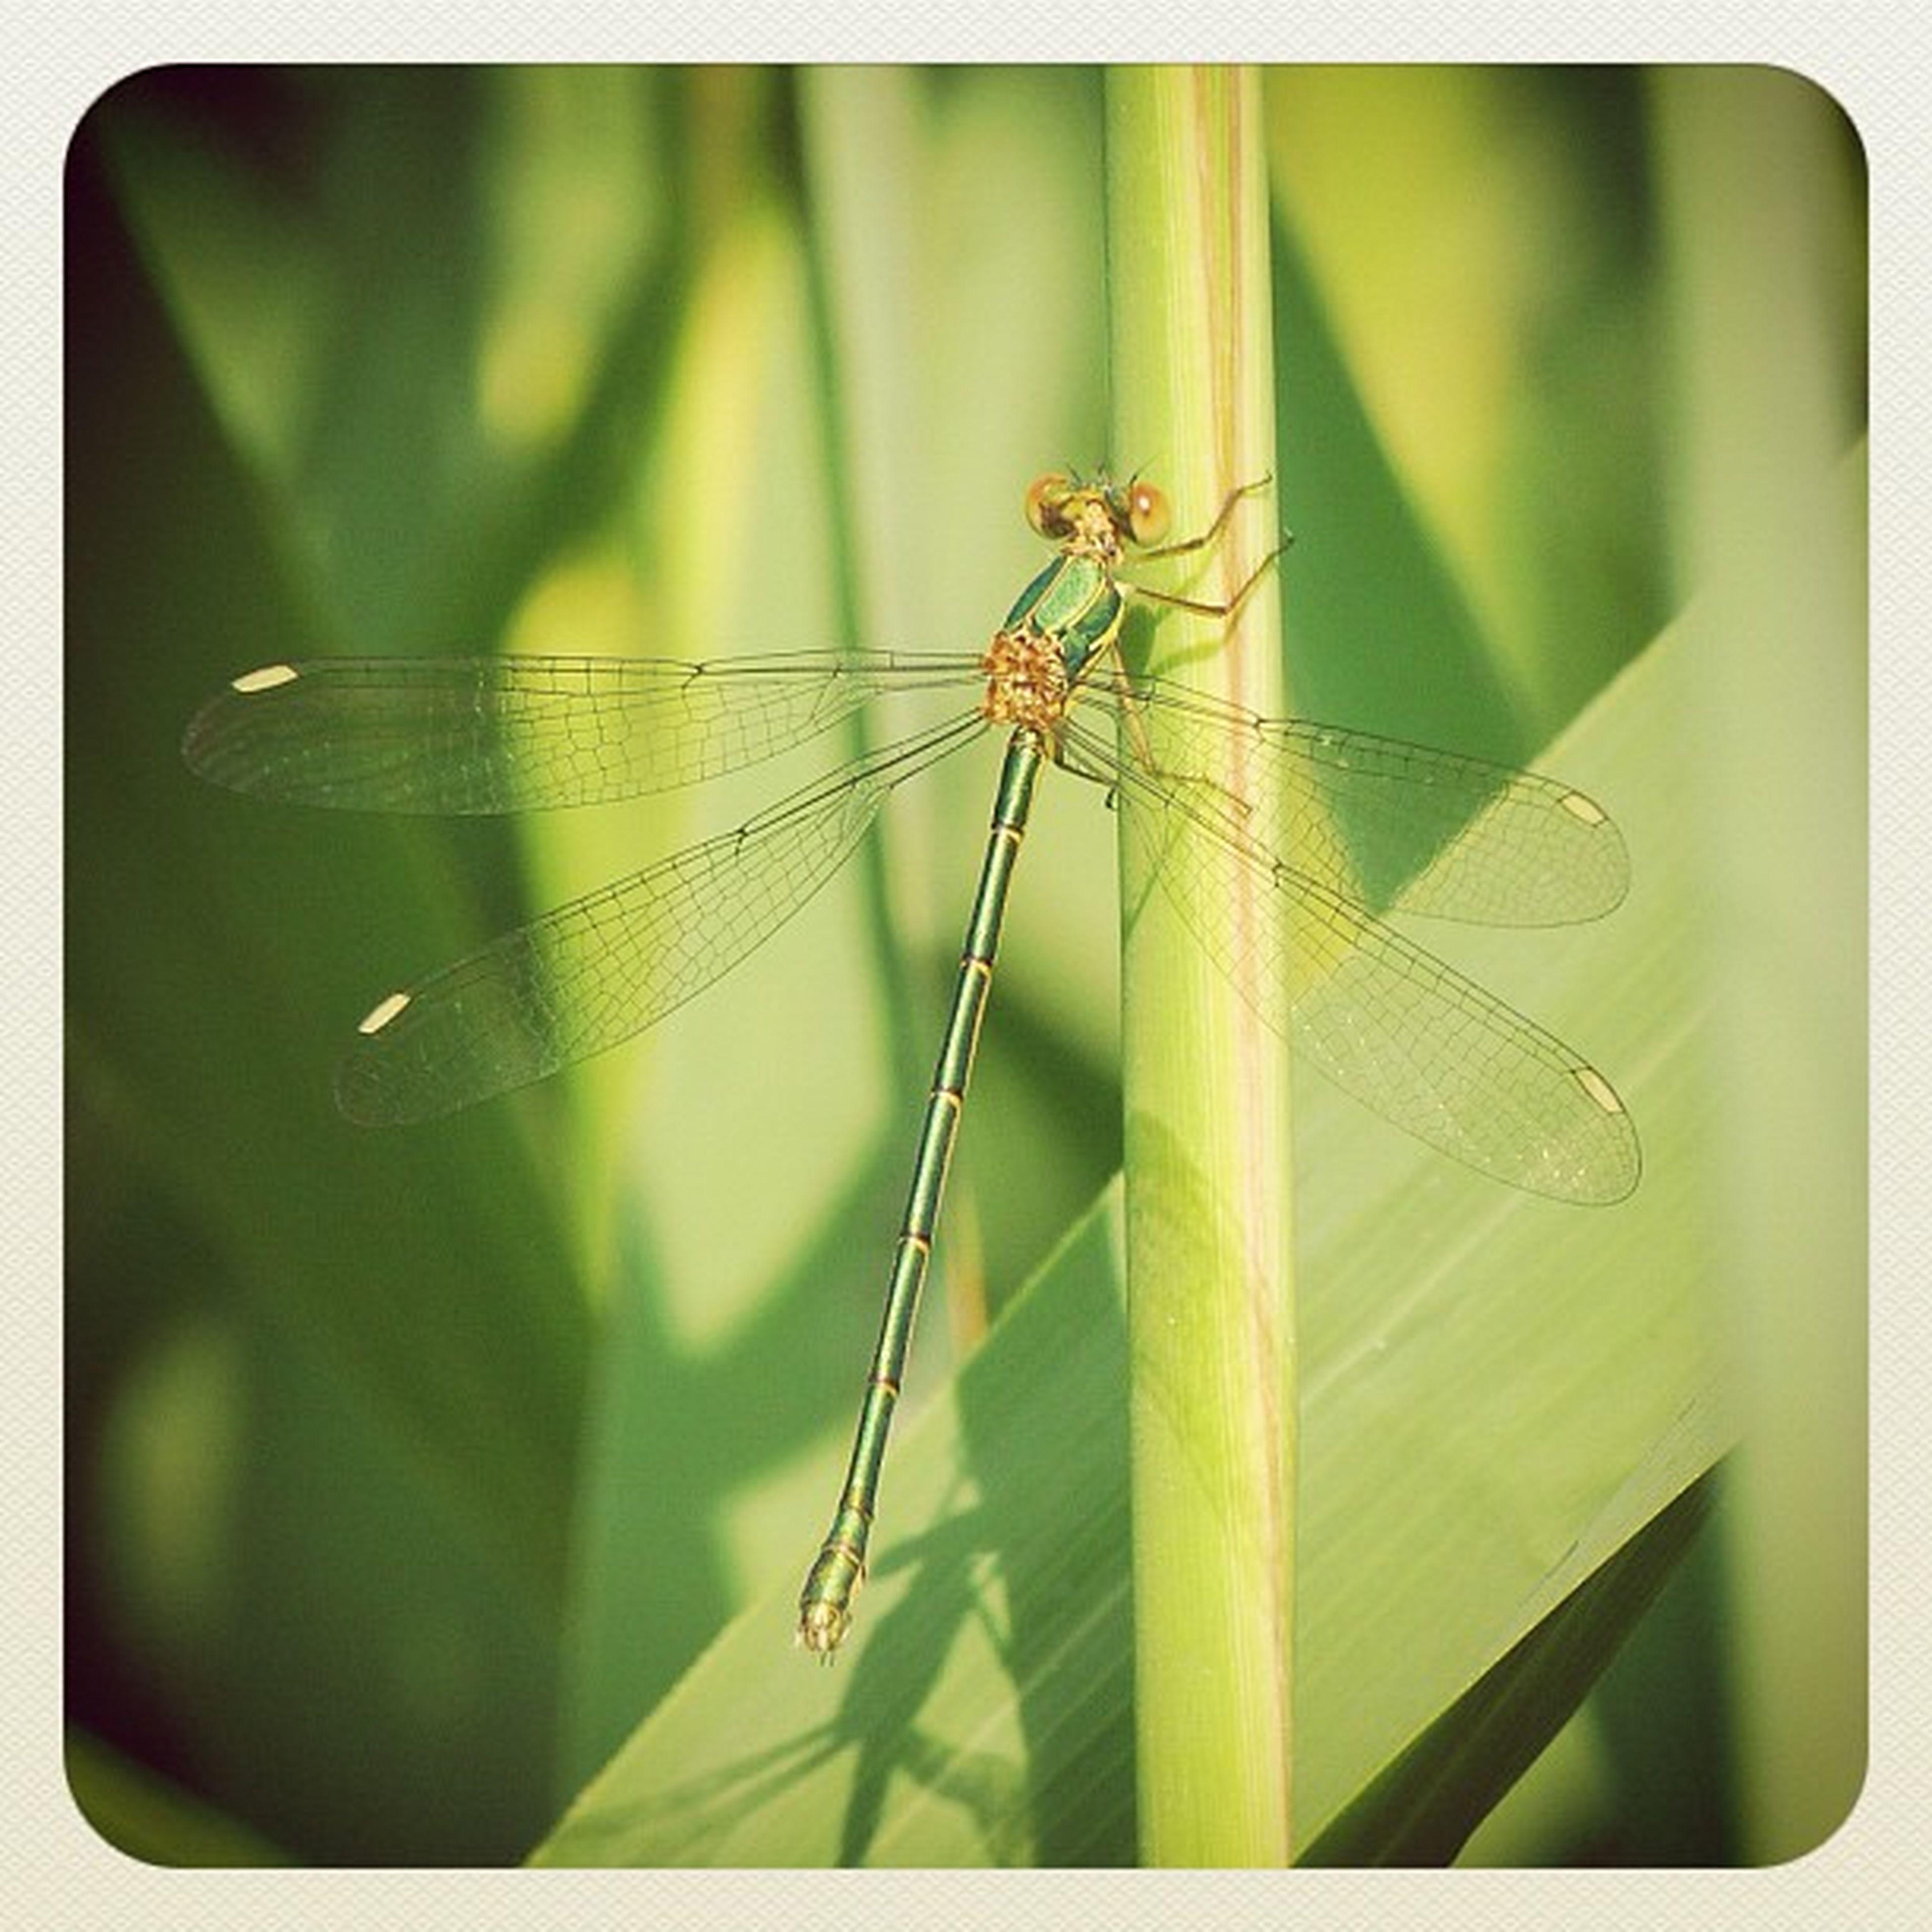 Natureporn Natureeza Nature Insect libelle copter libelula dragonfly insect naarden naturelovers dragonflies iphonesia